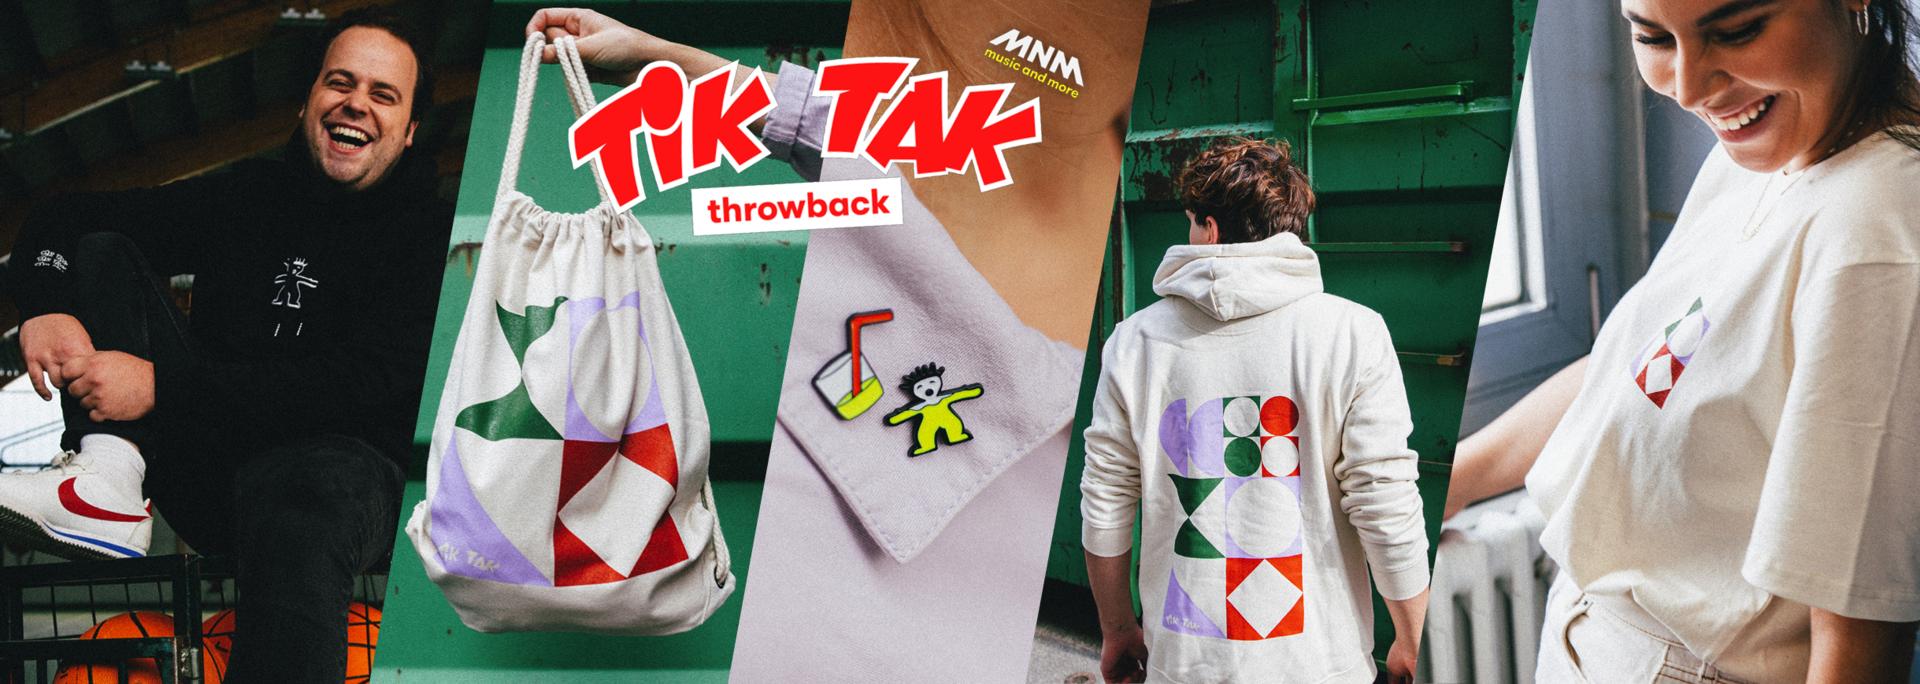 https://shop.mnm.be/Textiel